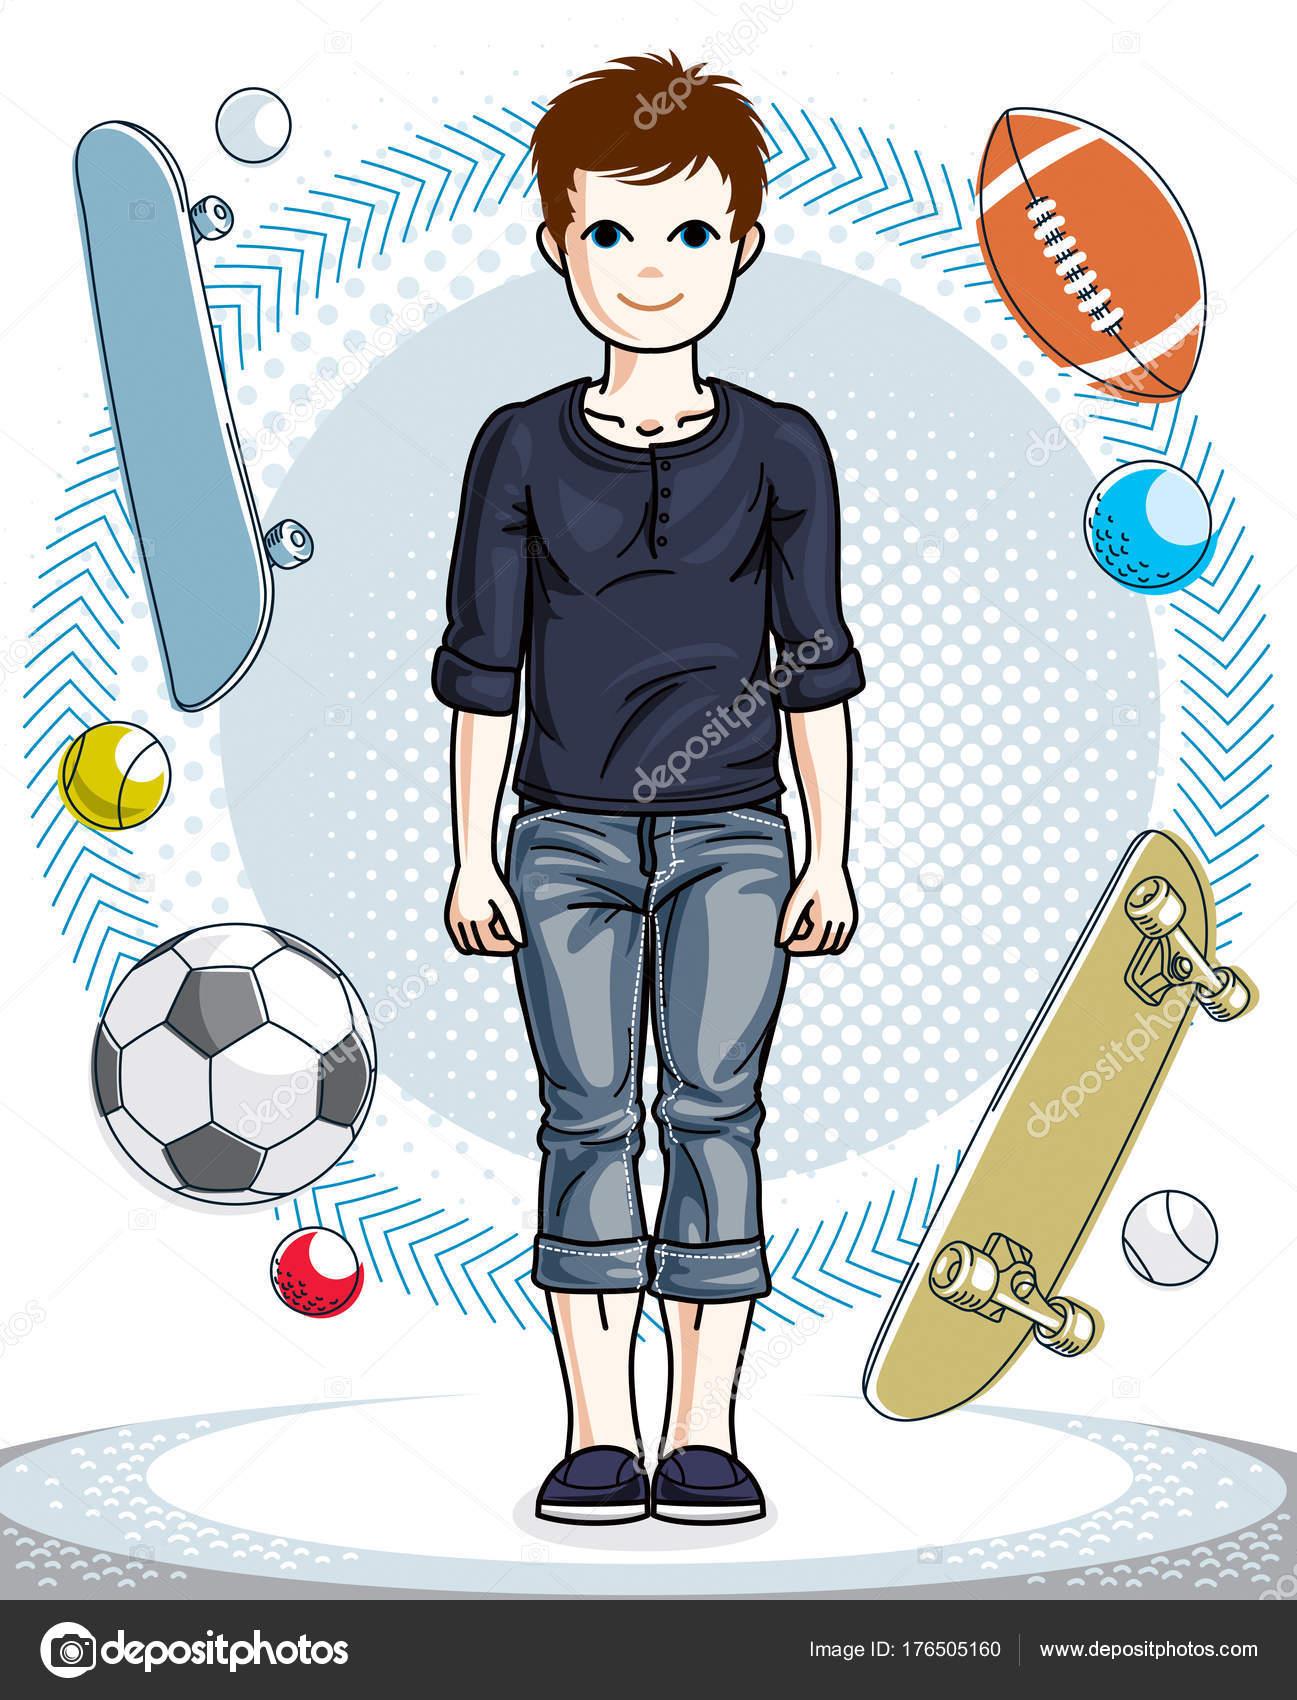 2e3ebafa296 Νέοι έφηβος αγόρι παιδί χαριτωμένο στέκεται σε κομψά casual ρούχα.  Διανυσματικό χαρακτήρα. Παιδική ηλικία lifestyle εικόνες clip art —  Διάνυσμα με ...